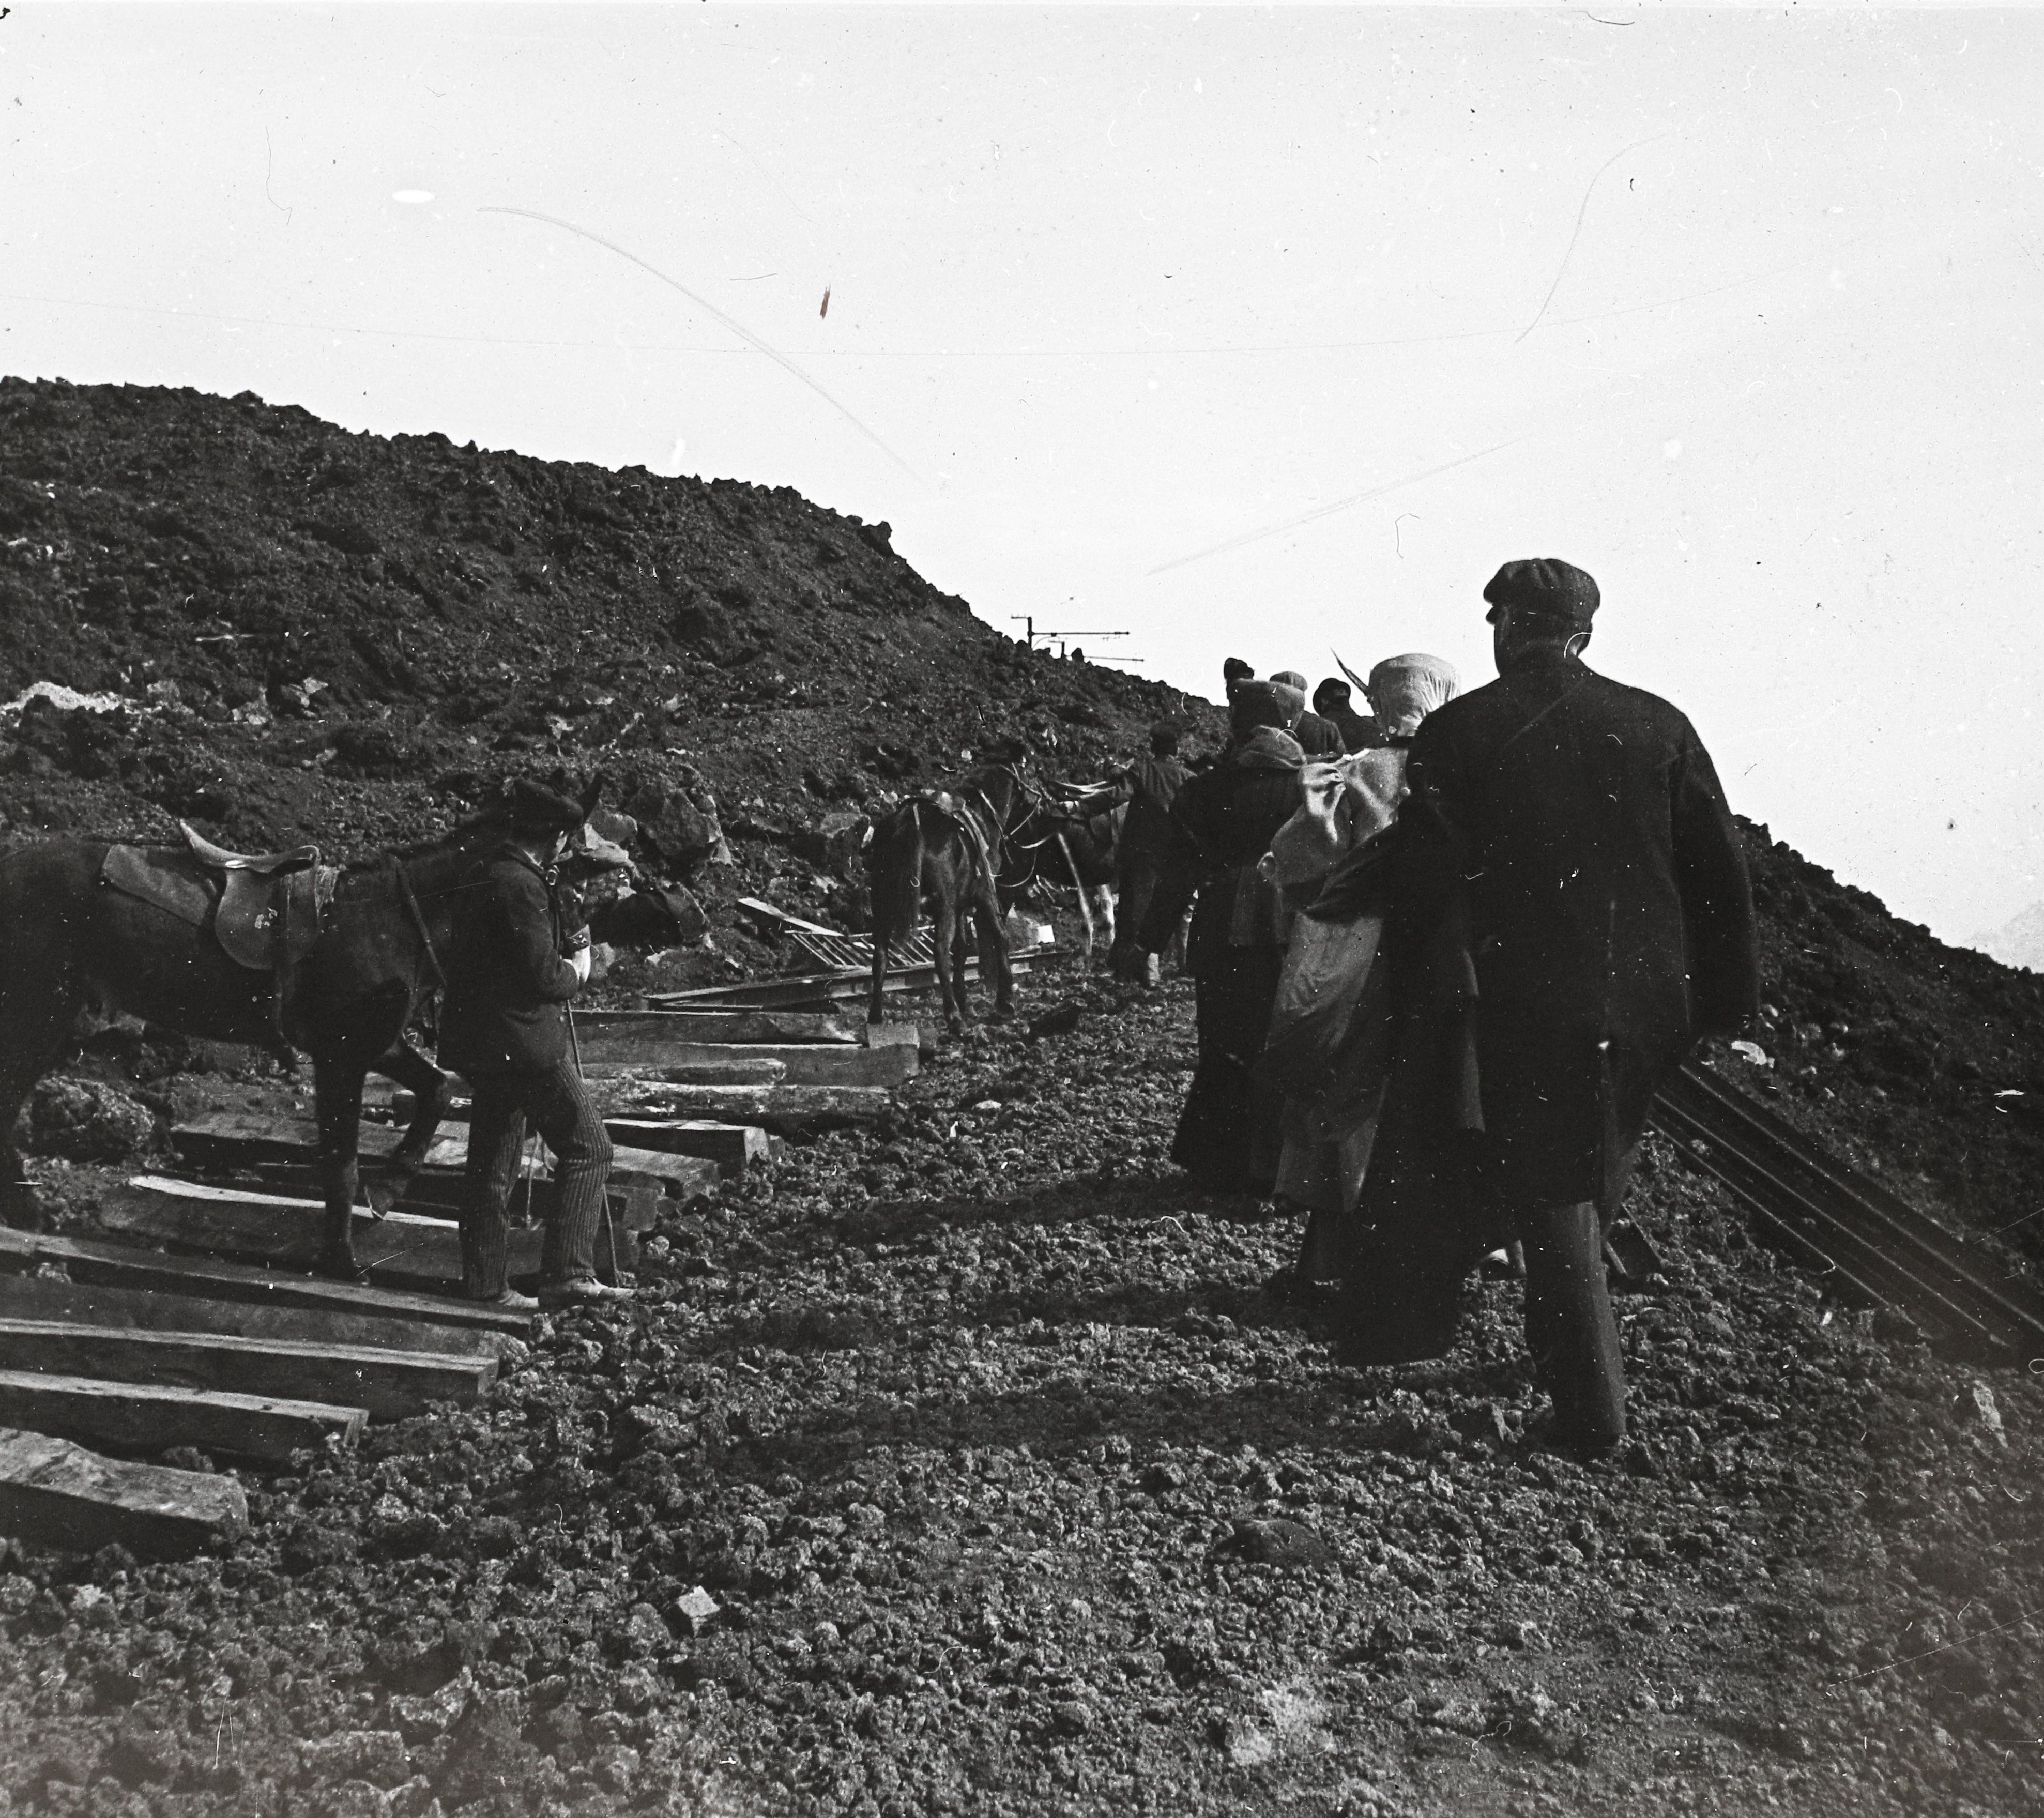 FileA Vezuvra Vezet Funiculare Megsemmislt Sinplyja Az 1906 Prilis 9 I Vulknkitrs